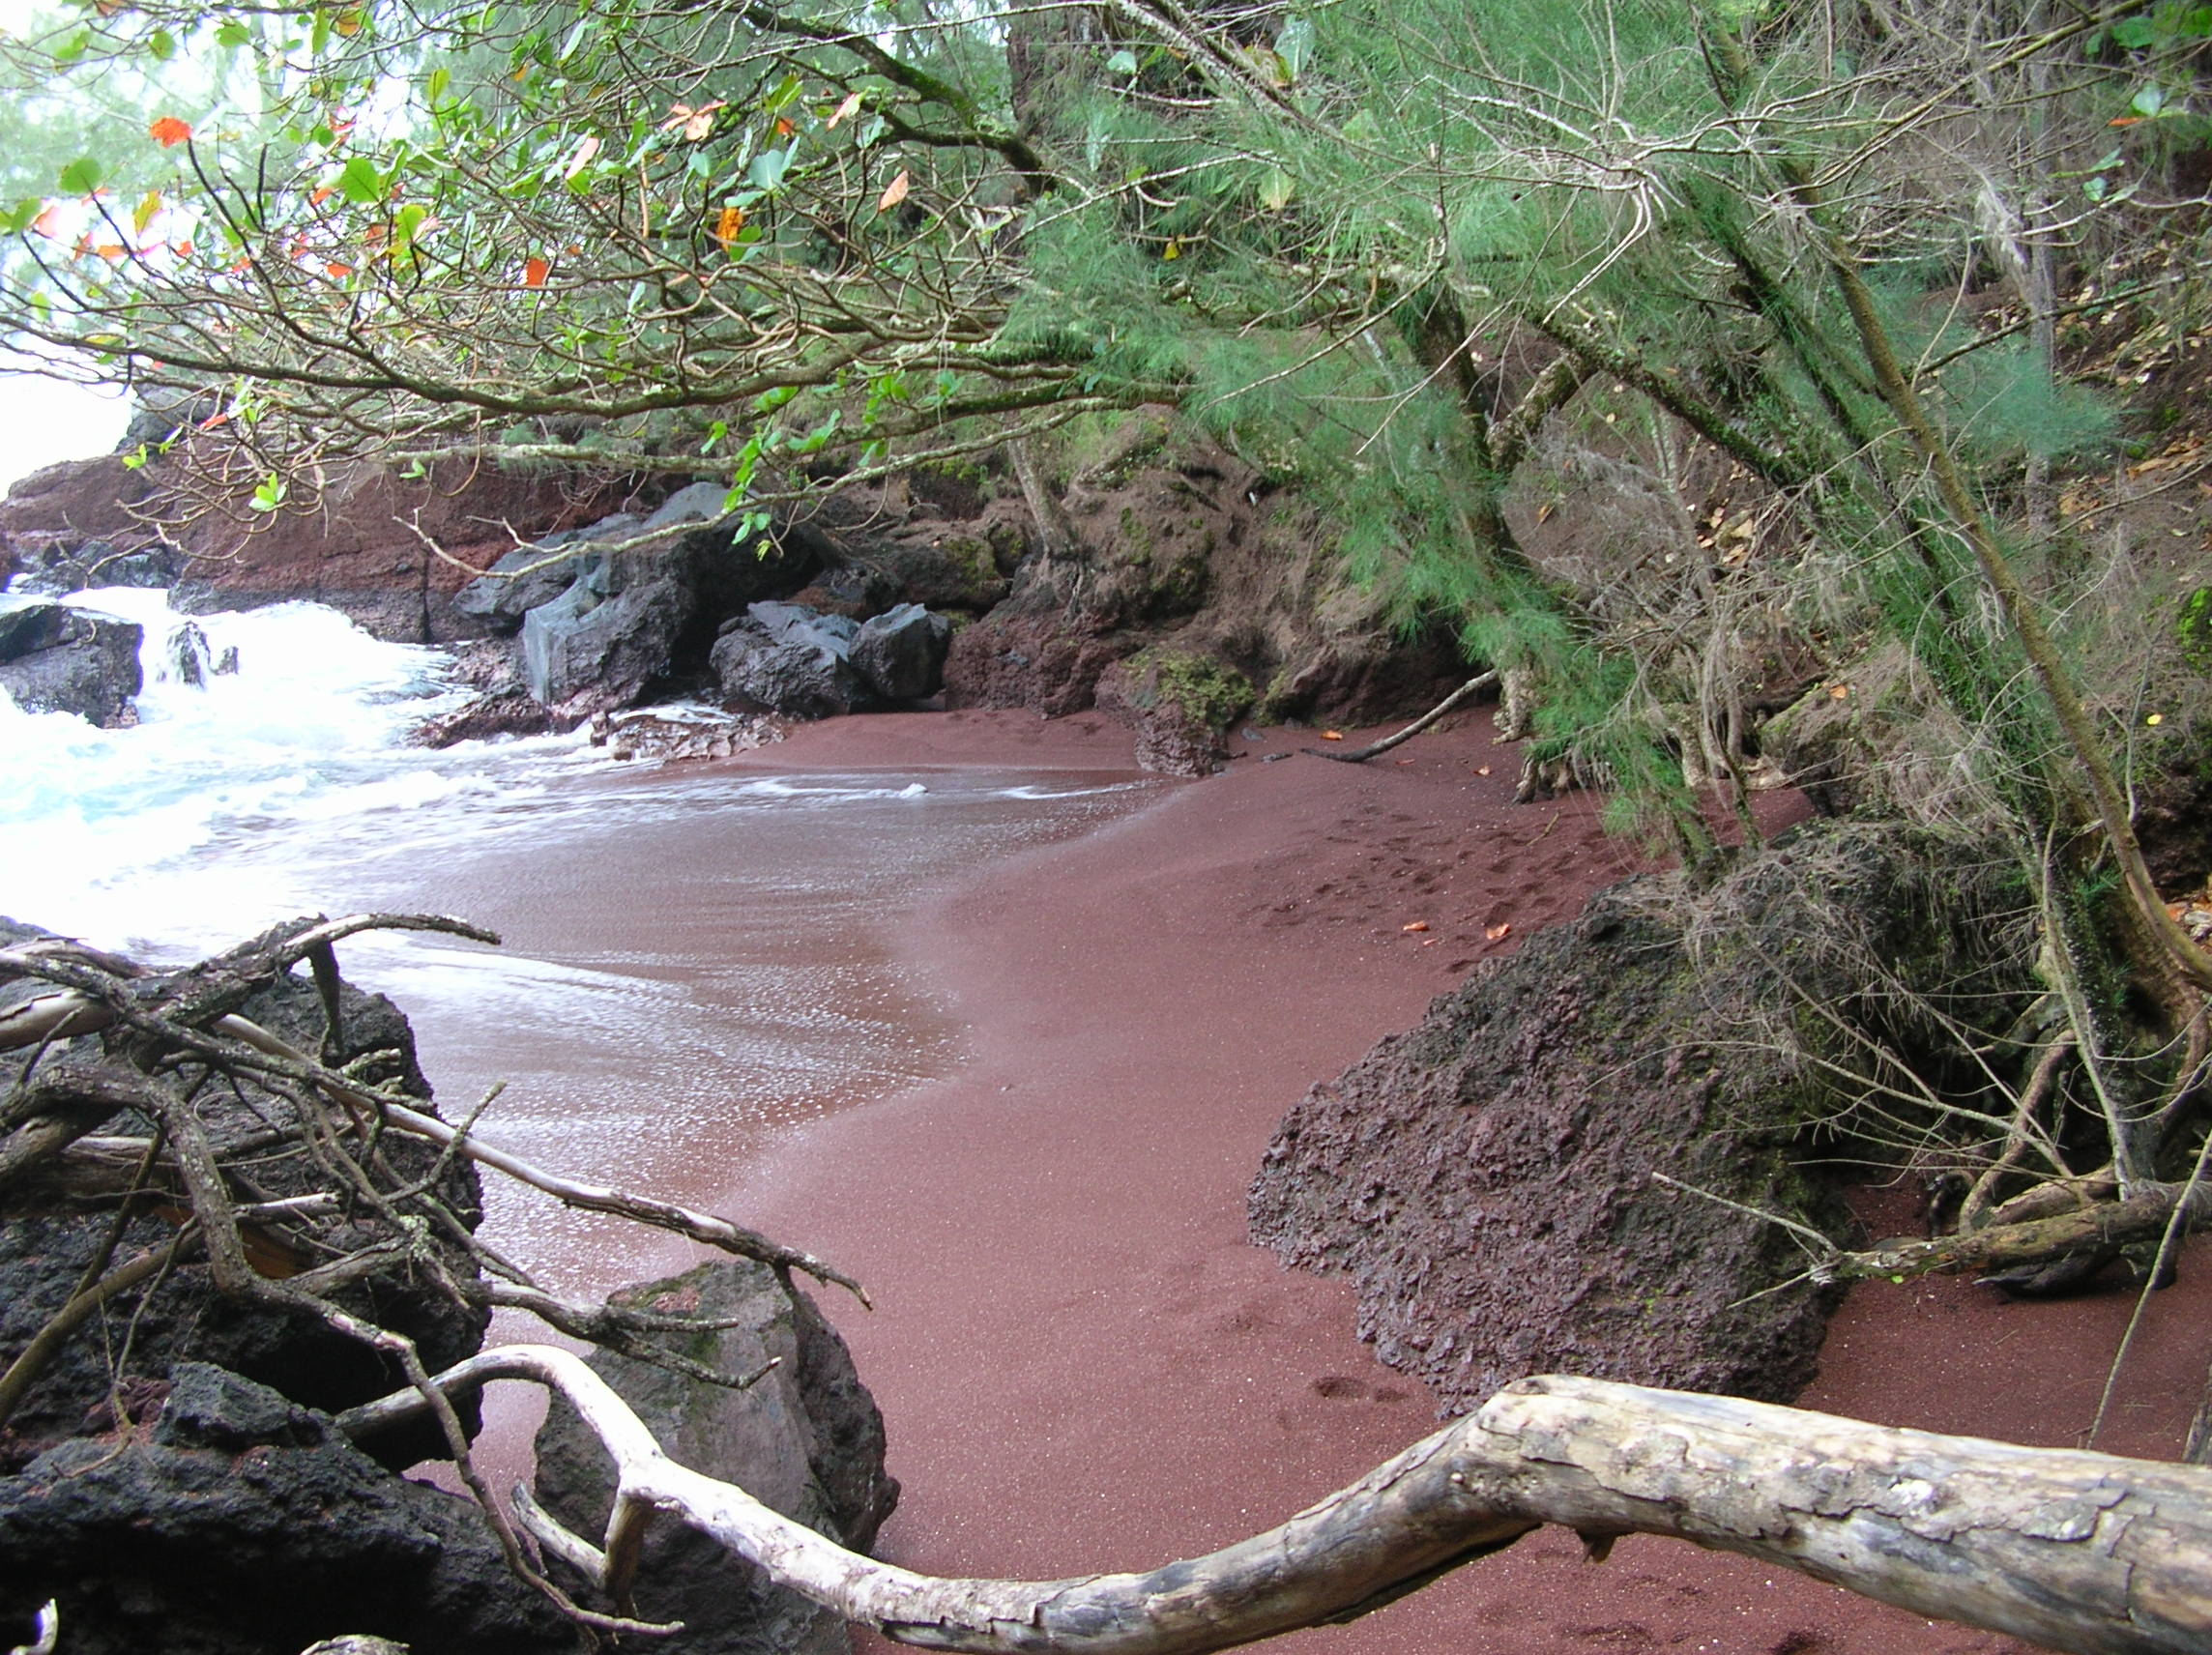 Red sand beach, near Hana, HA